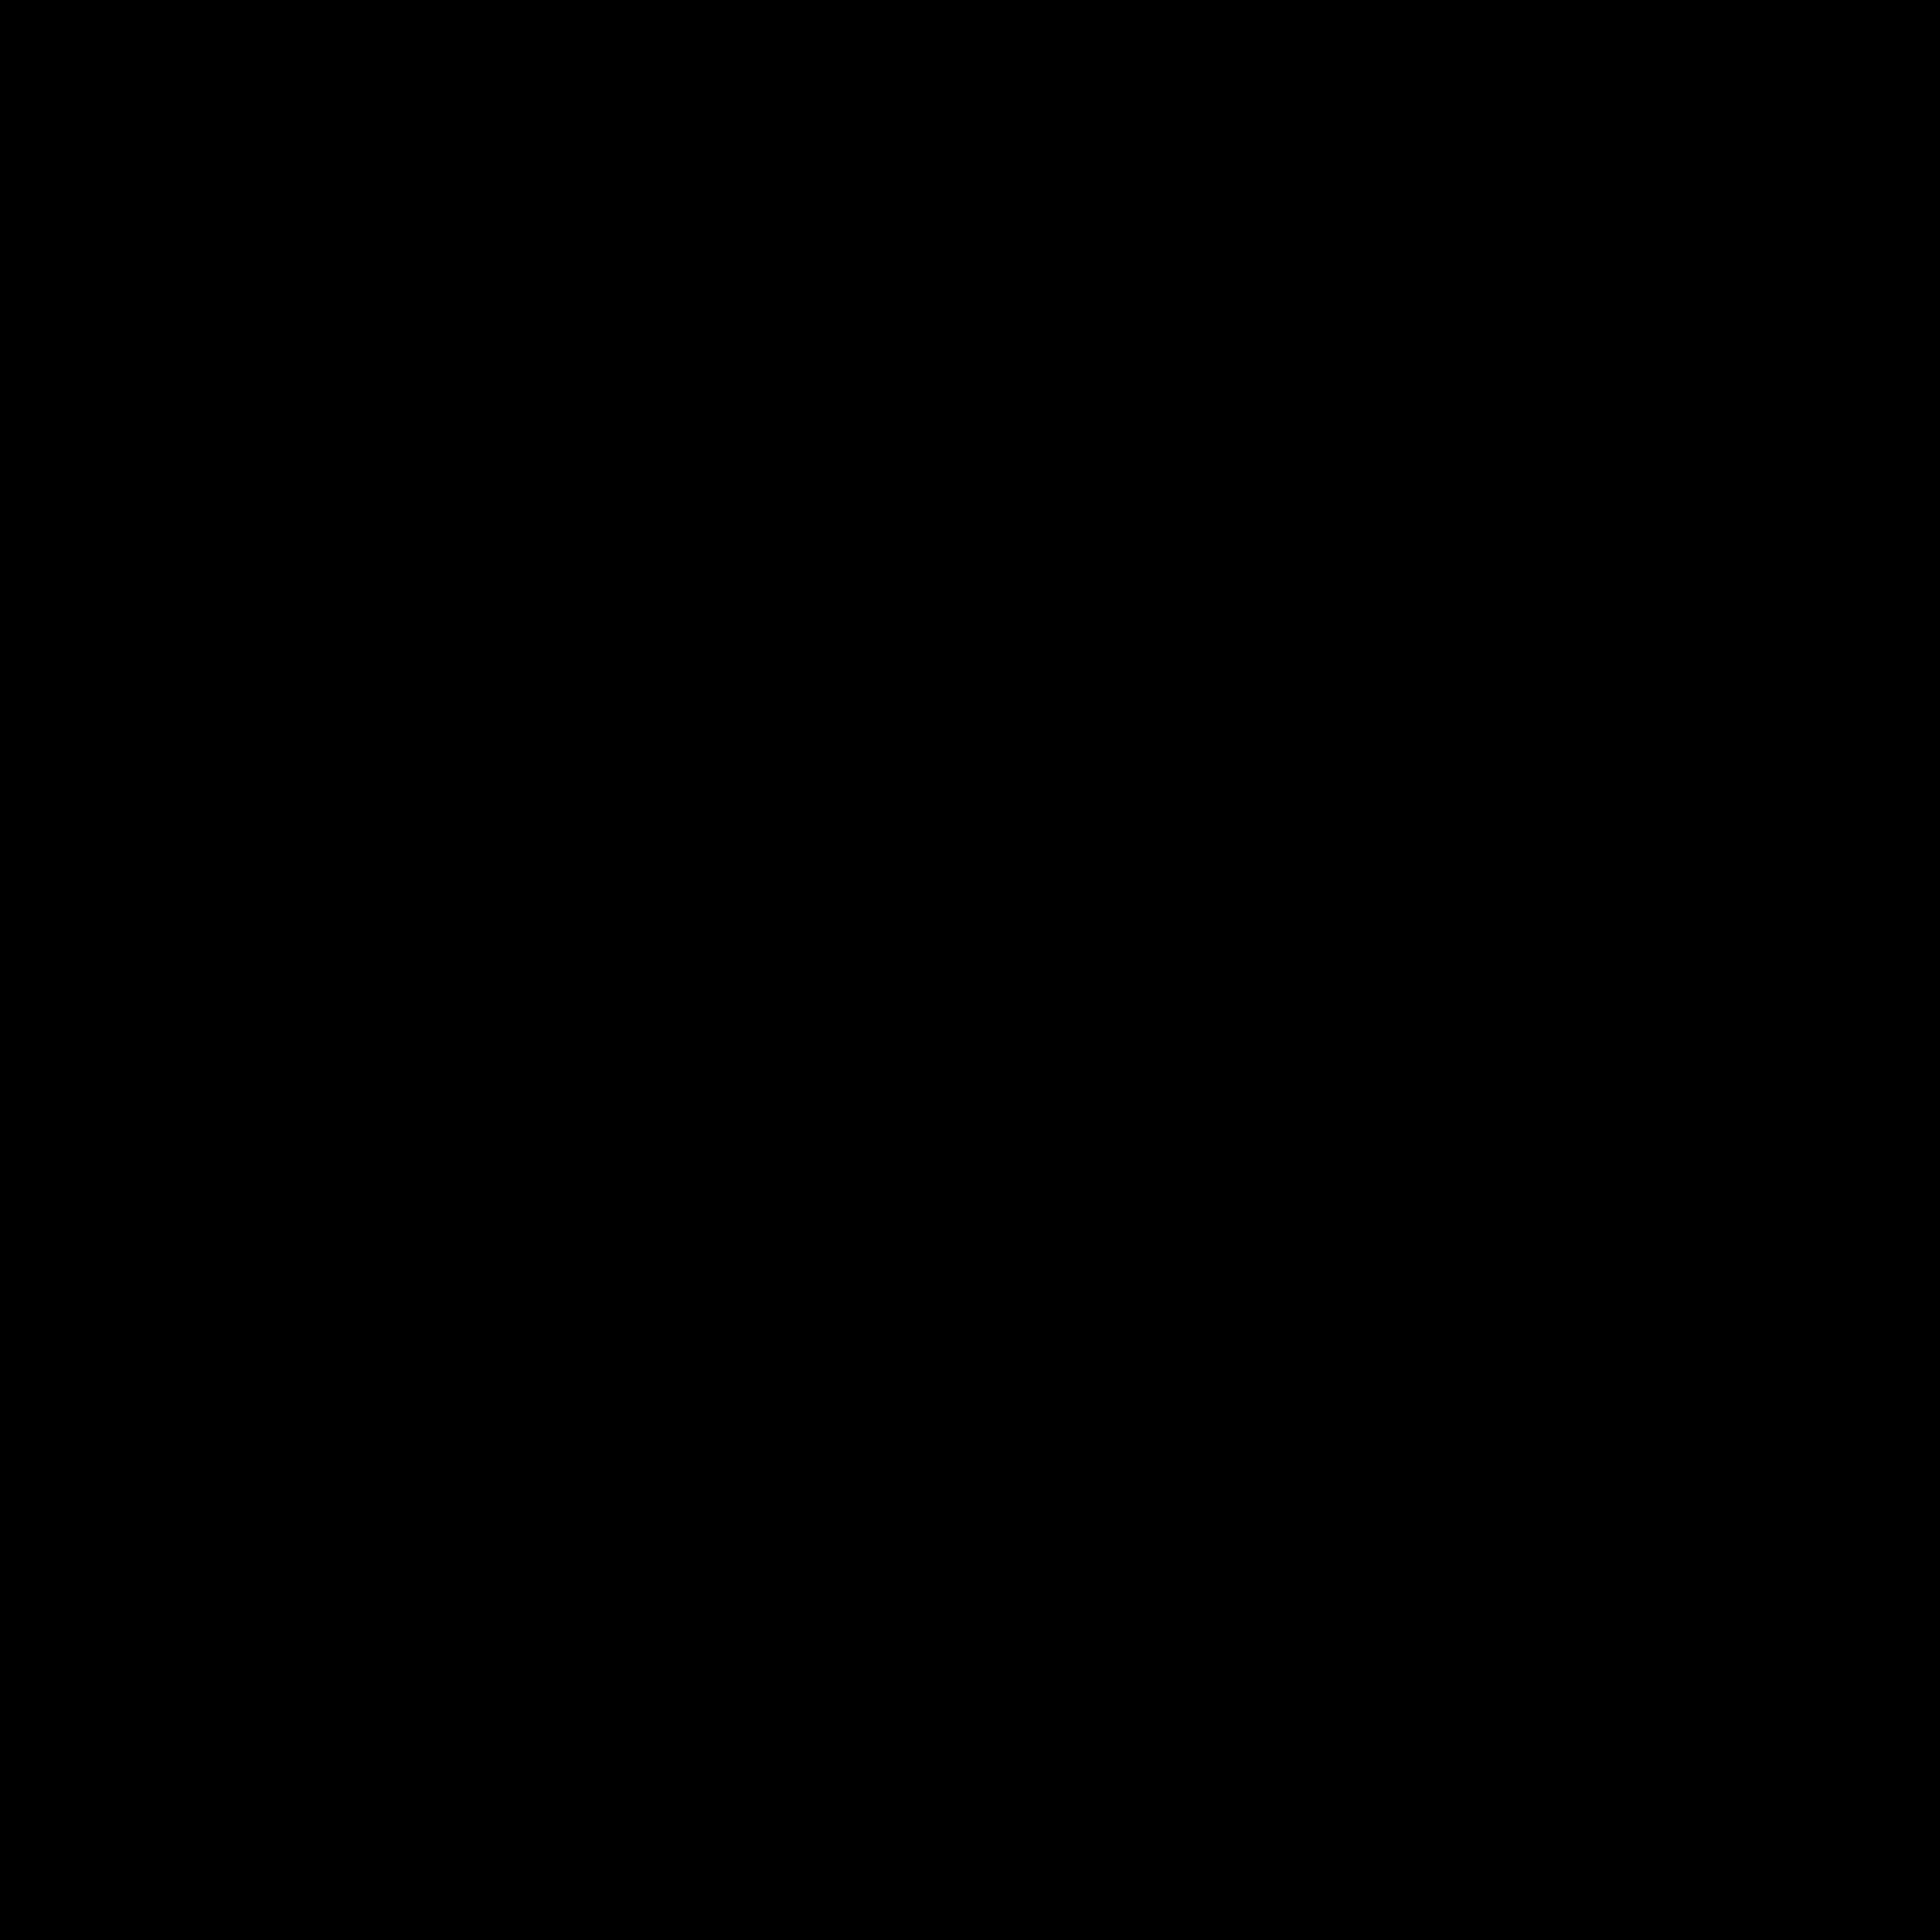 Quaker State Logo PNG Transparent & SVG Vector.